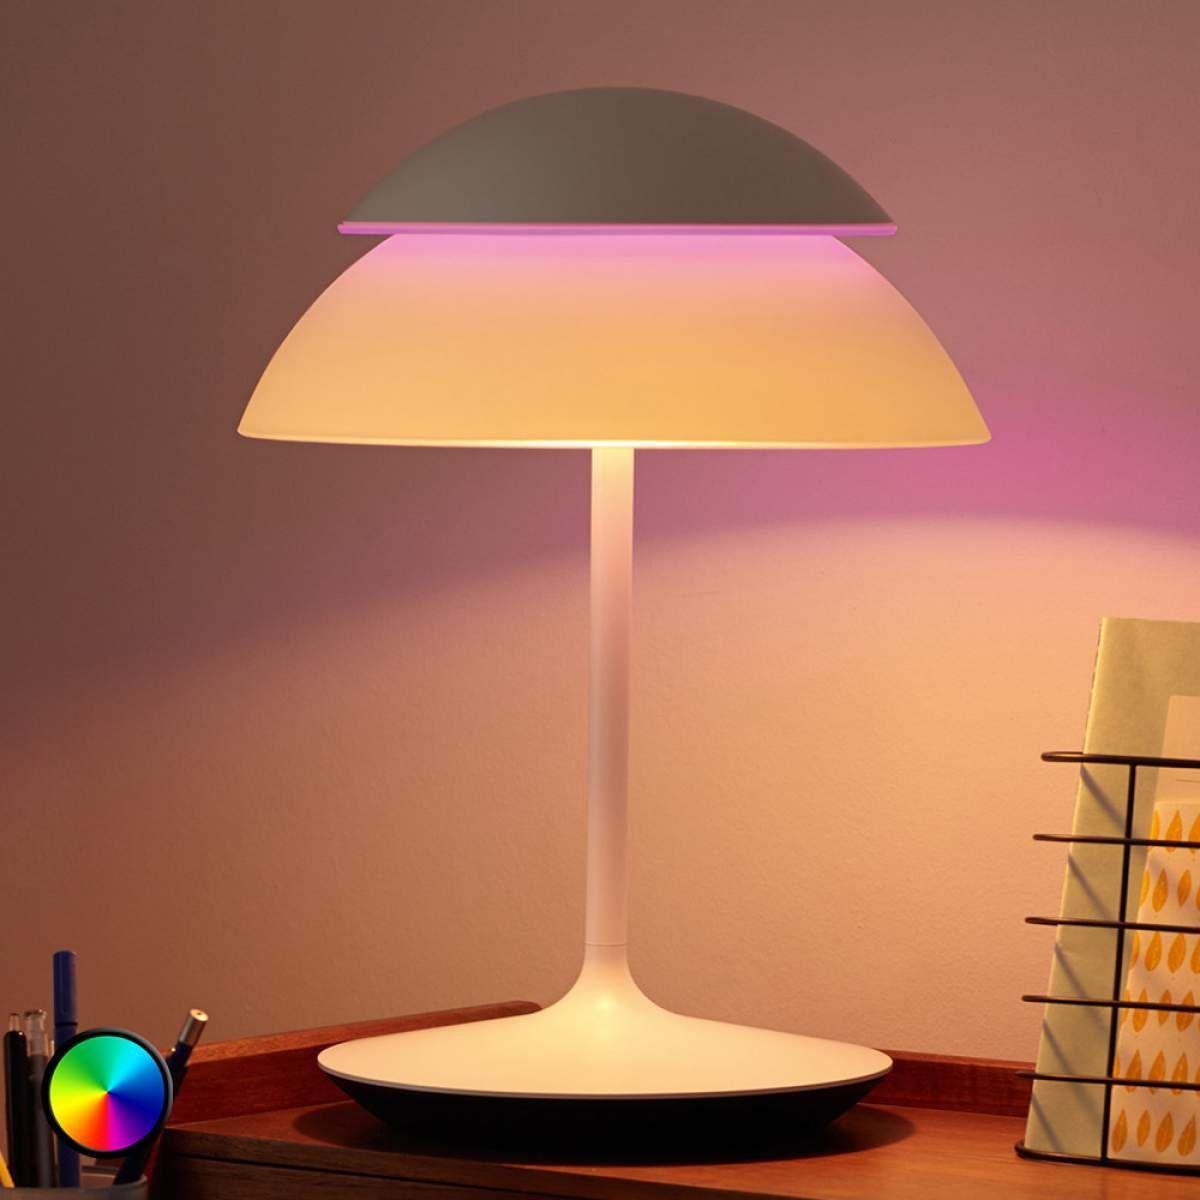 Poser Beyondlampe Lampe À Led Philips Hue xroBdeC